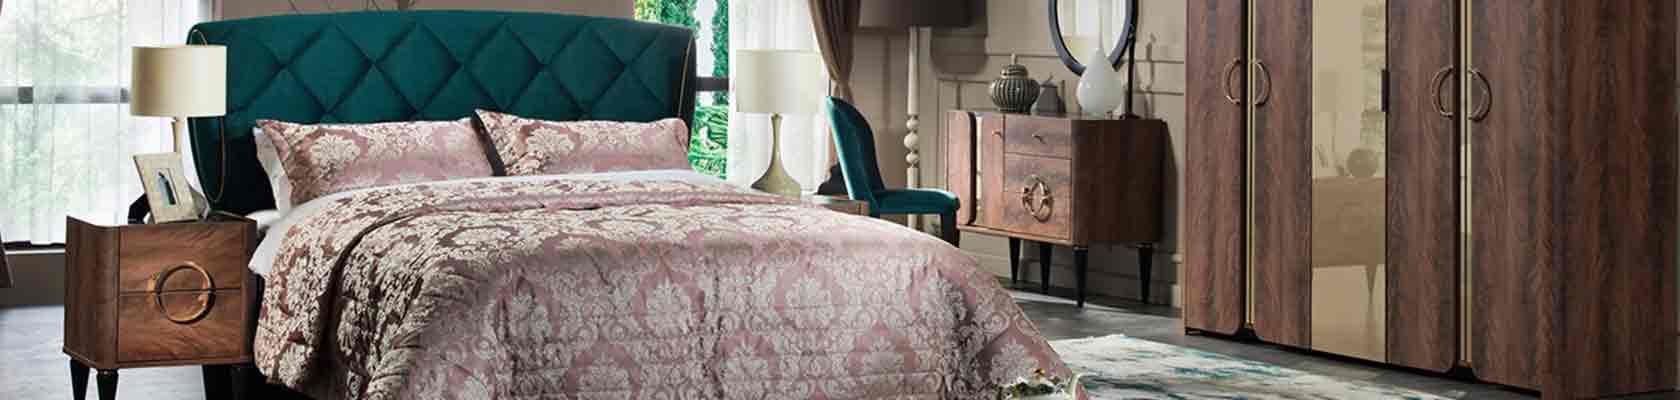 mobila_dormitor_clasic